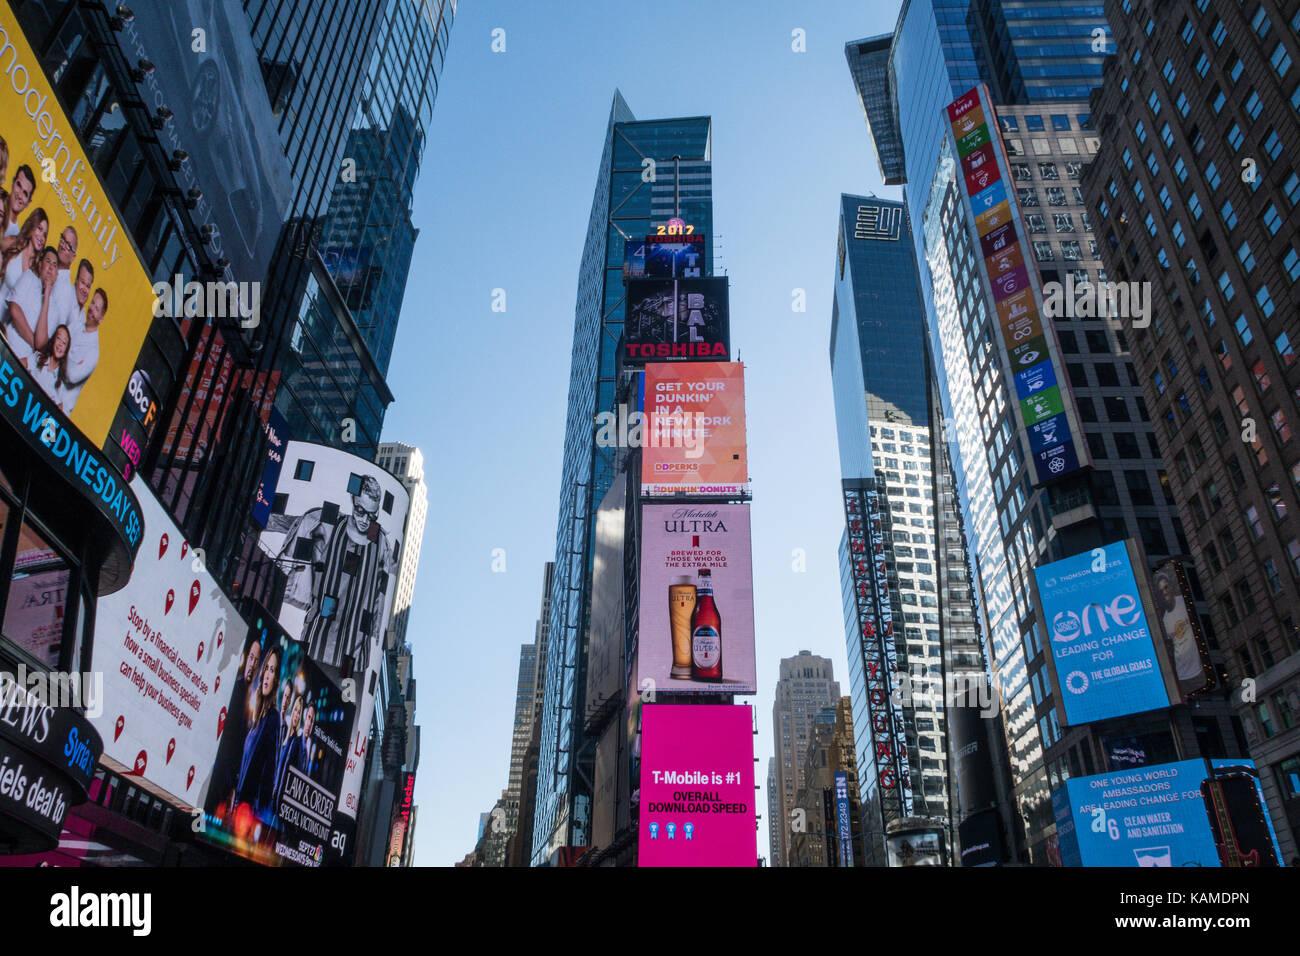 Elektronische Werbung Anschlagtafeln in Times Square, New York City, USA Stockbild